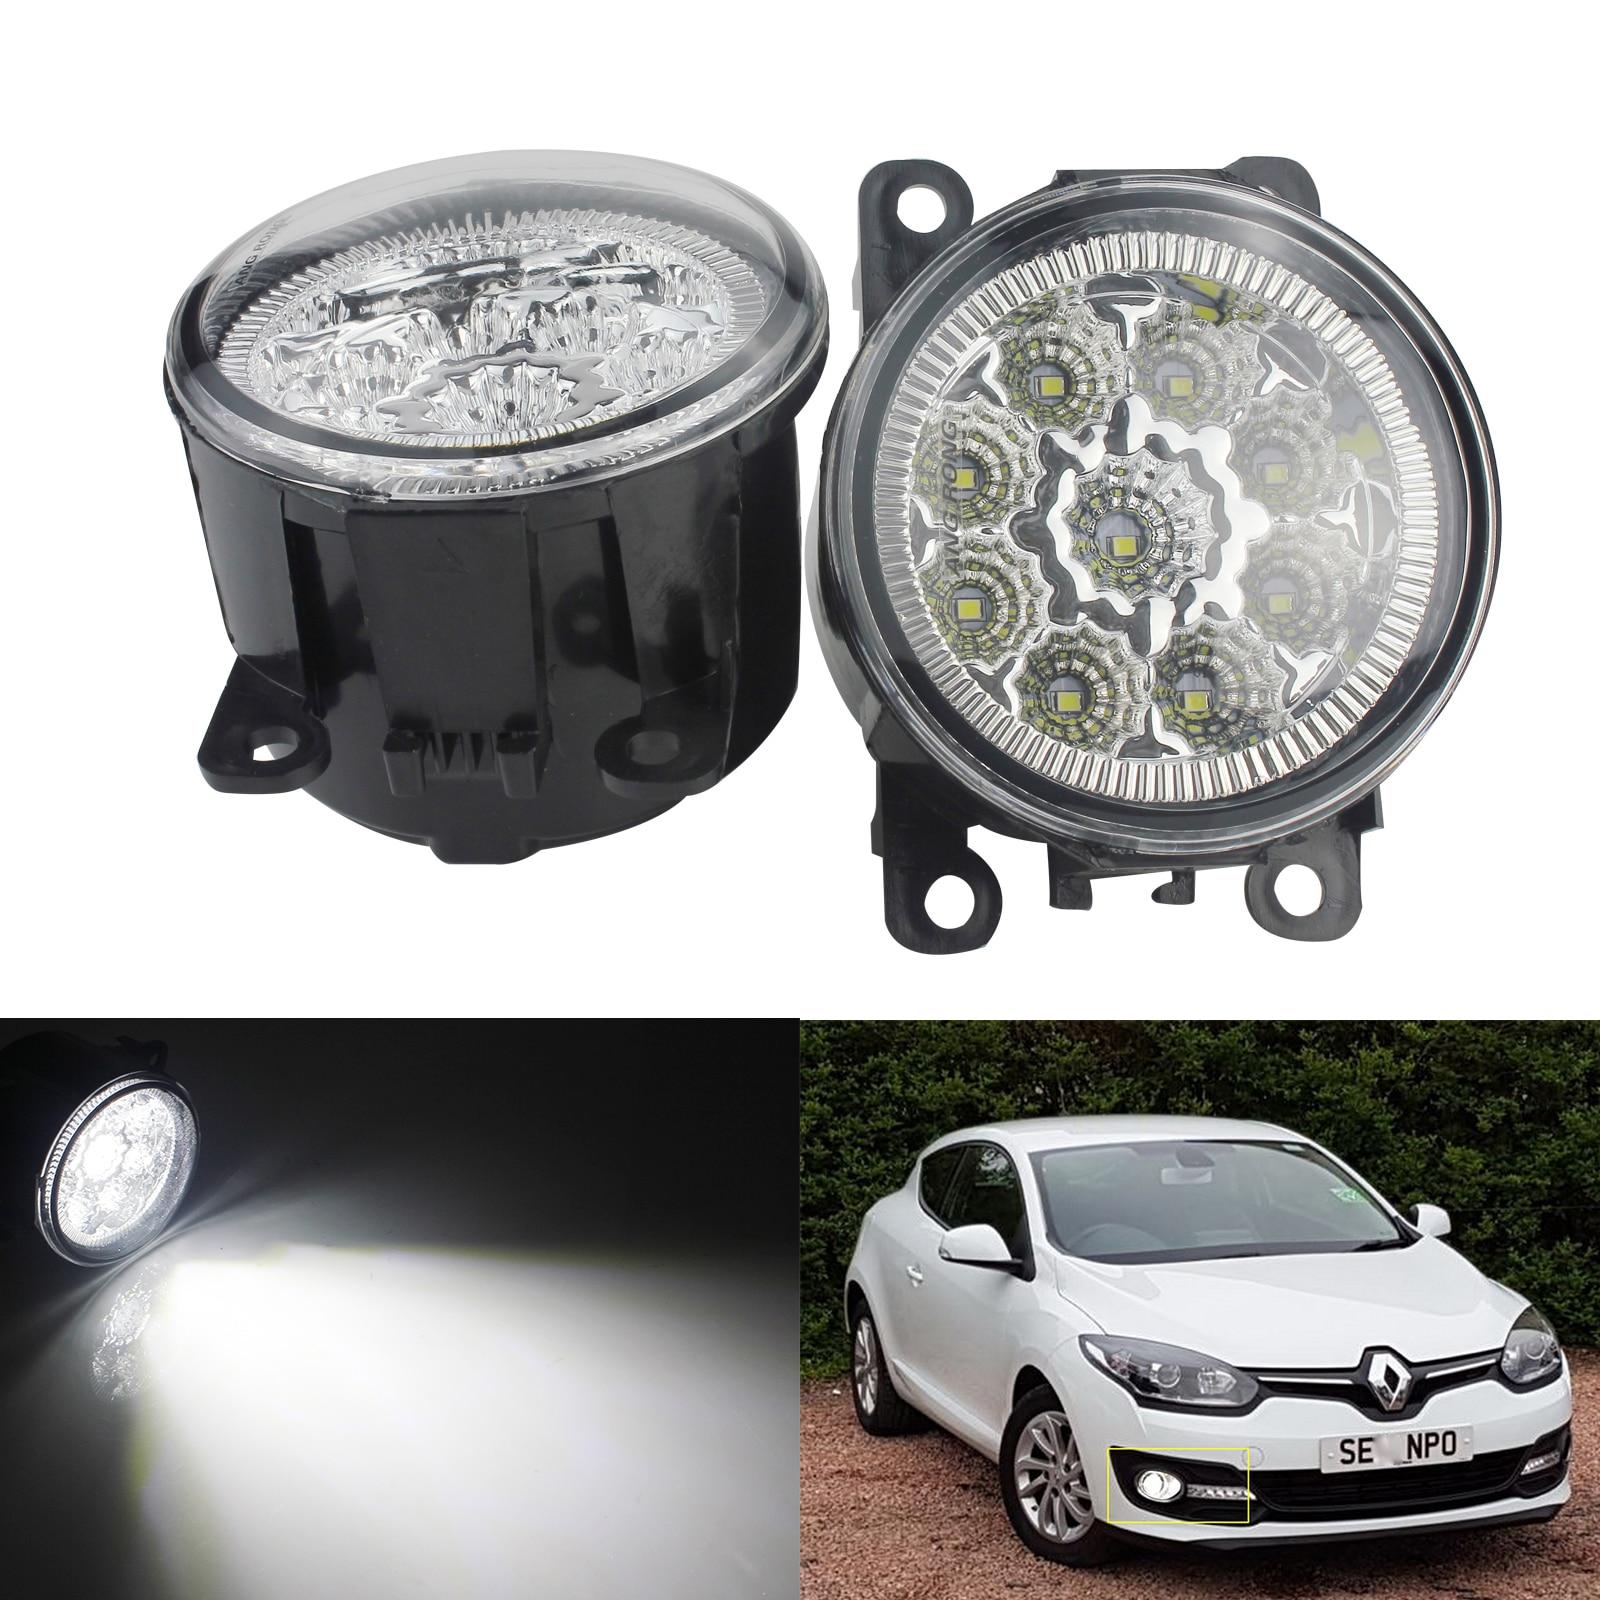 ANGRONG 2 uds 9 LED luz antiniebla delantera redonda DRL para Ford C-MAX Fiesta Focus Transit MK7 MK8